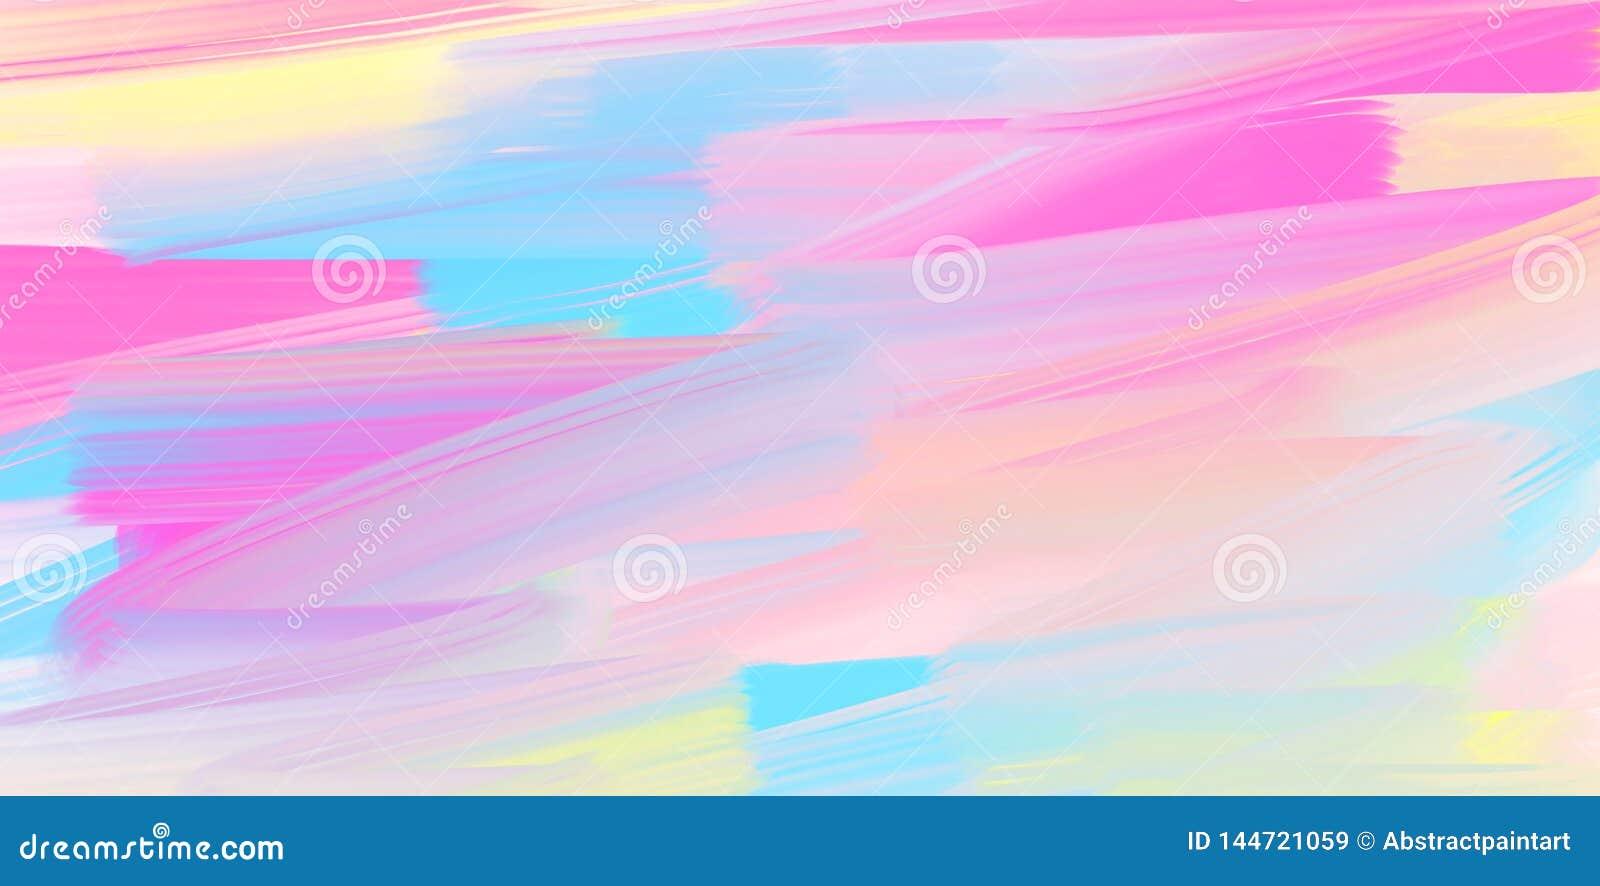 Abstrakter Aquarellhintergrund, bunte Beschaffenheit